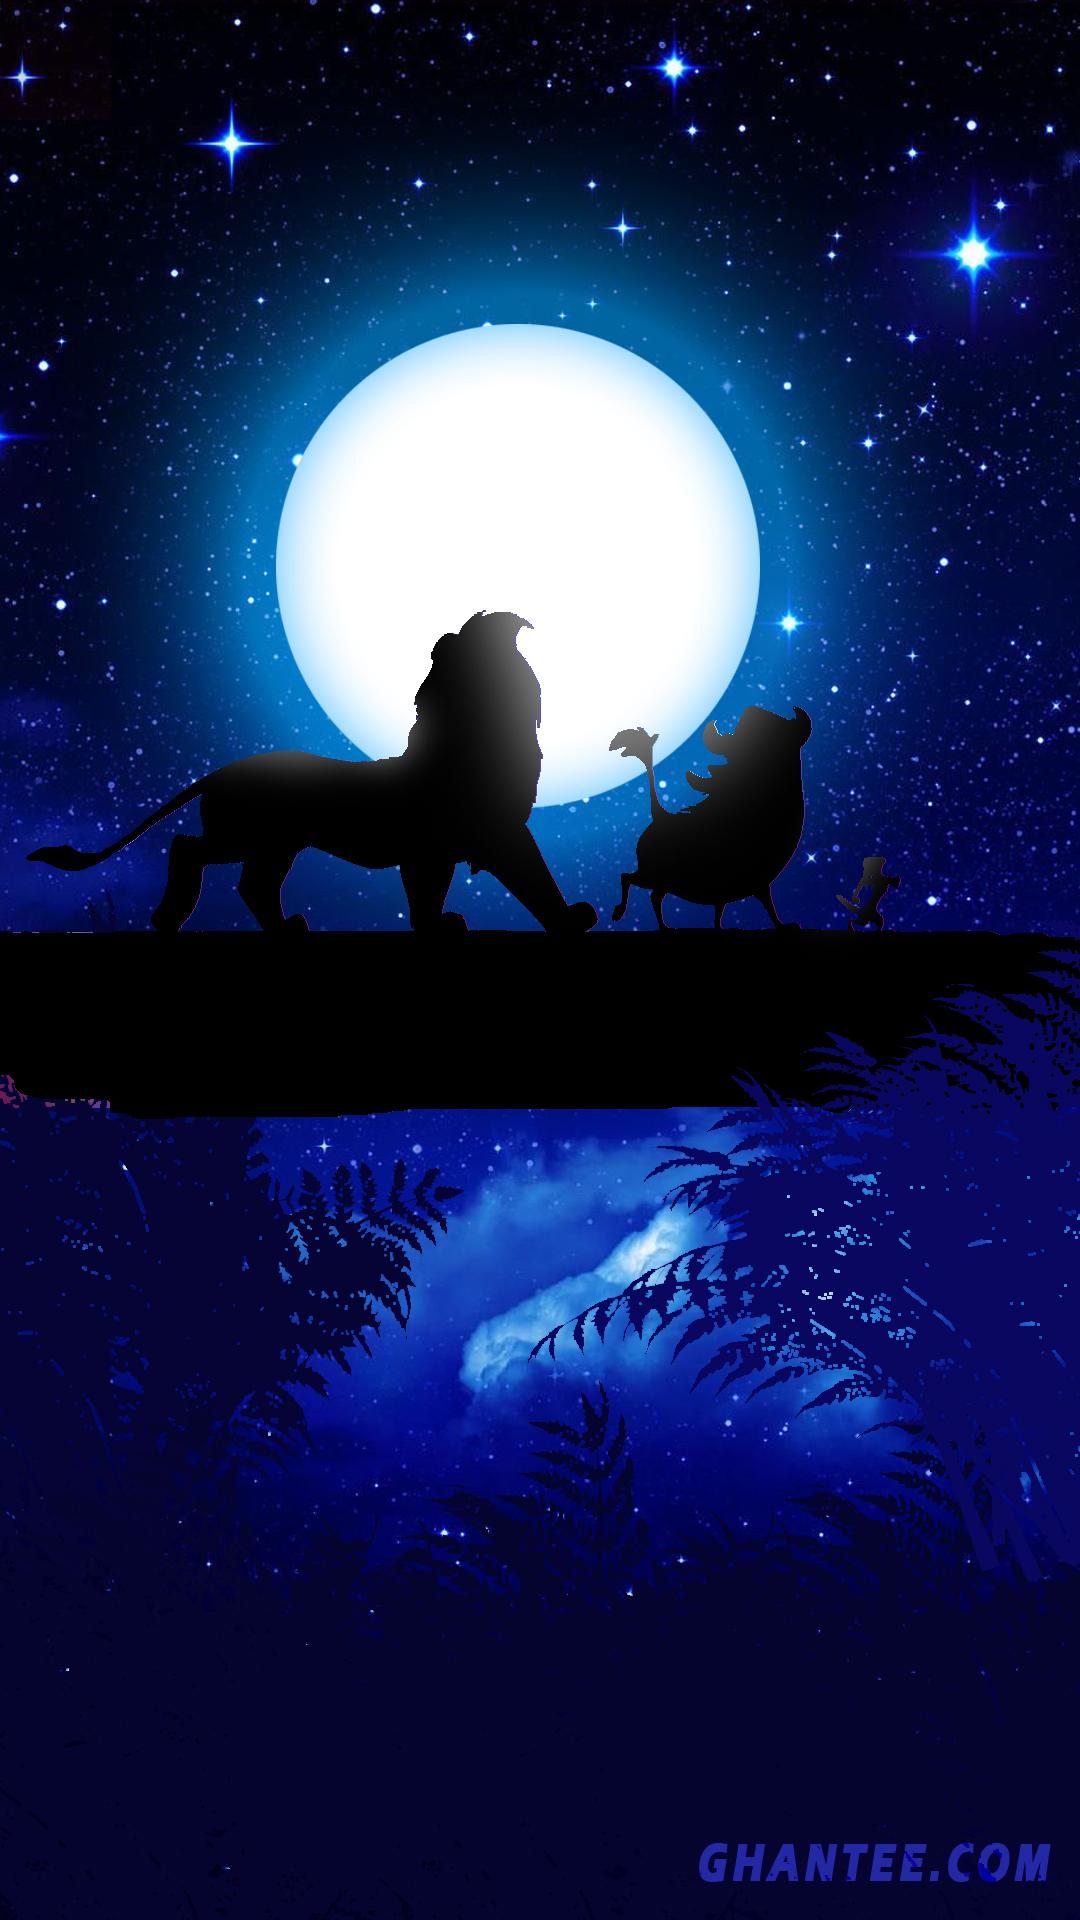 hakuna matata HD wallpaper – lion king